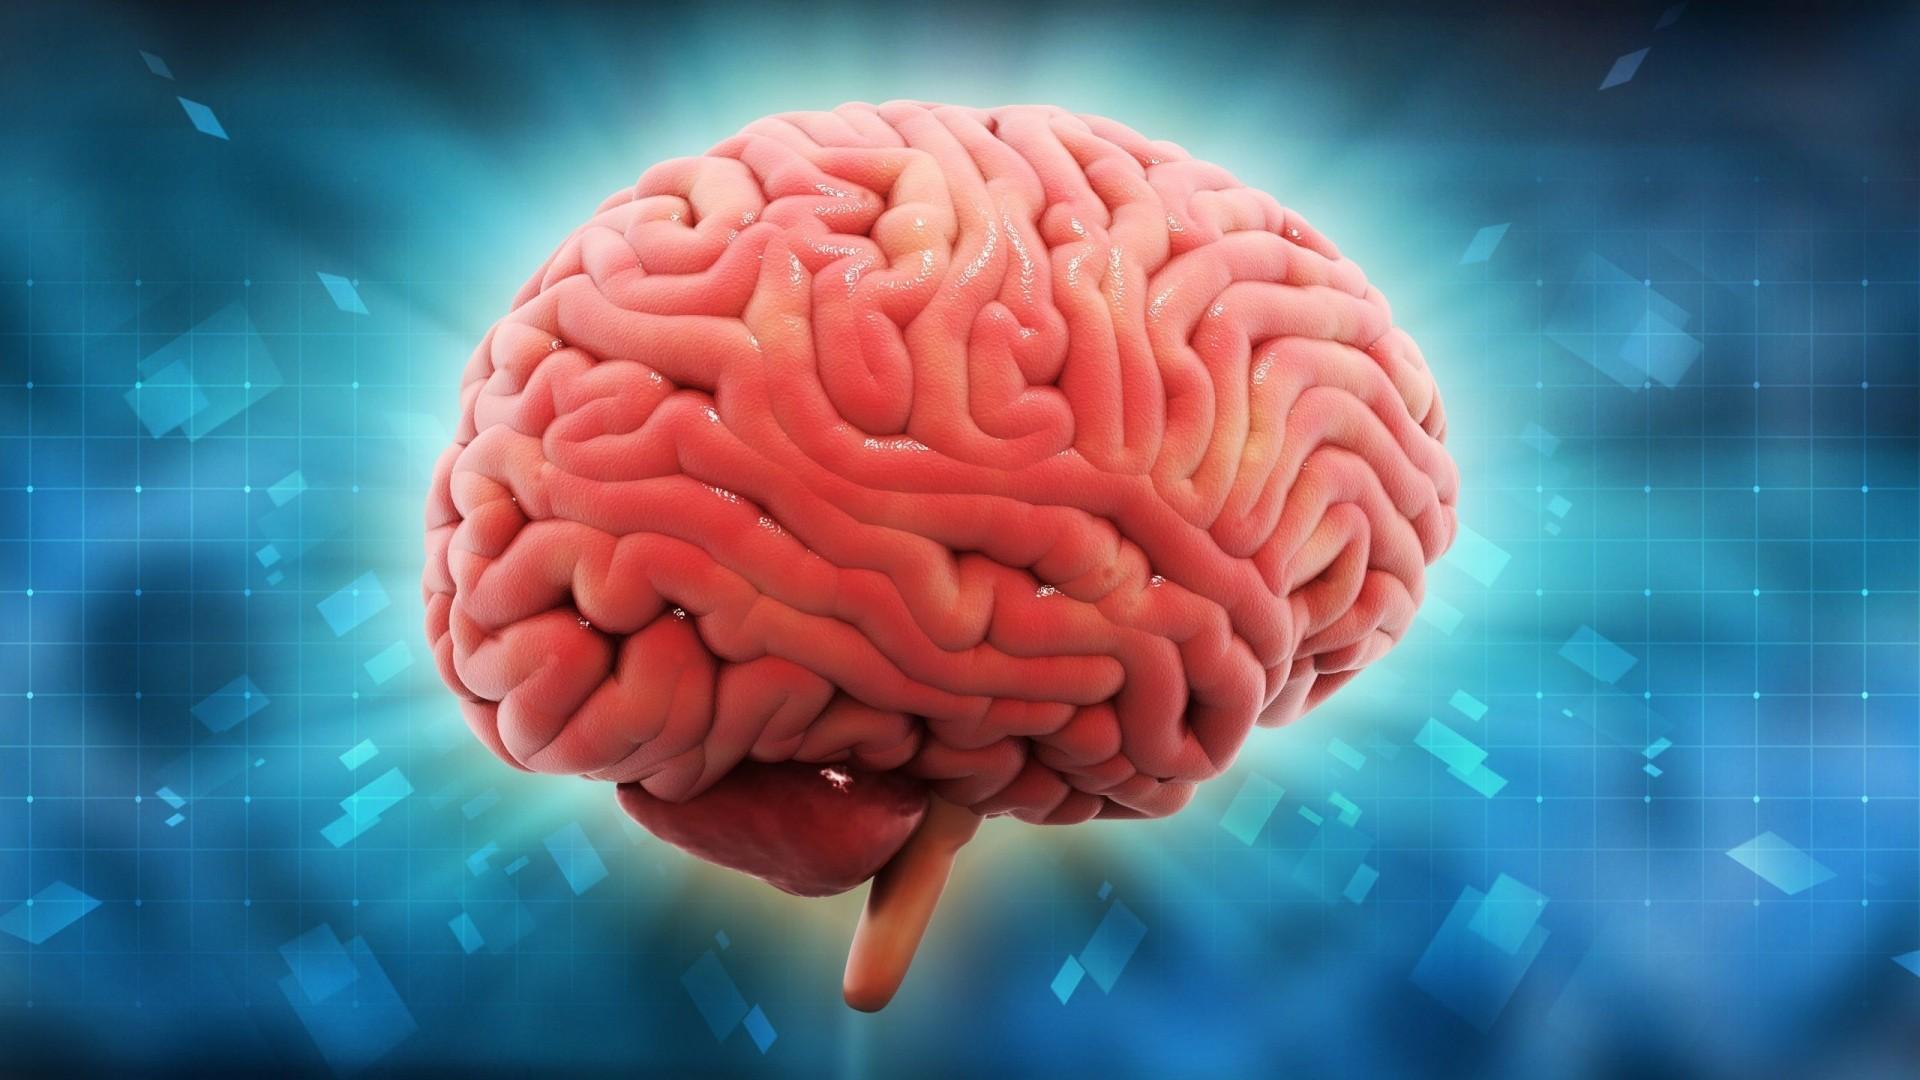 Human Brain Wallpaper